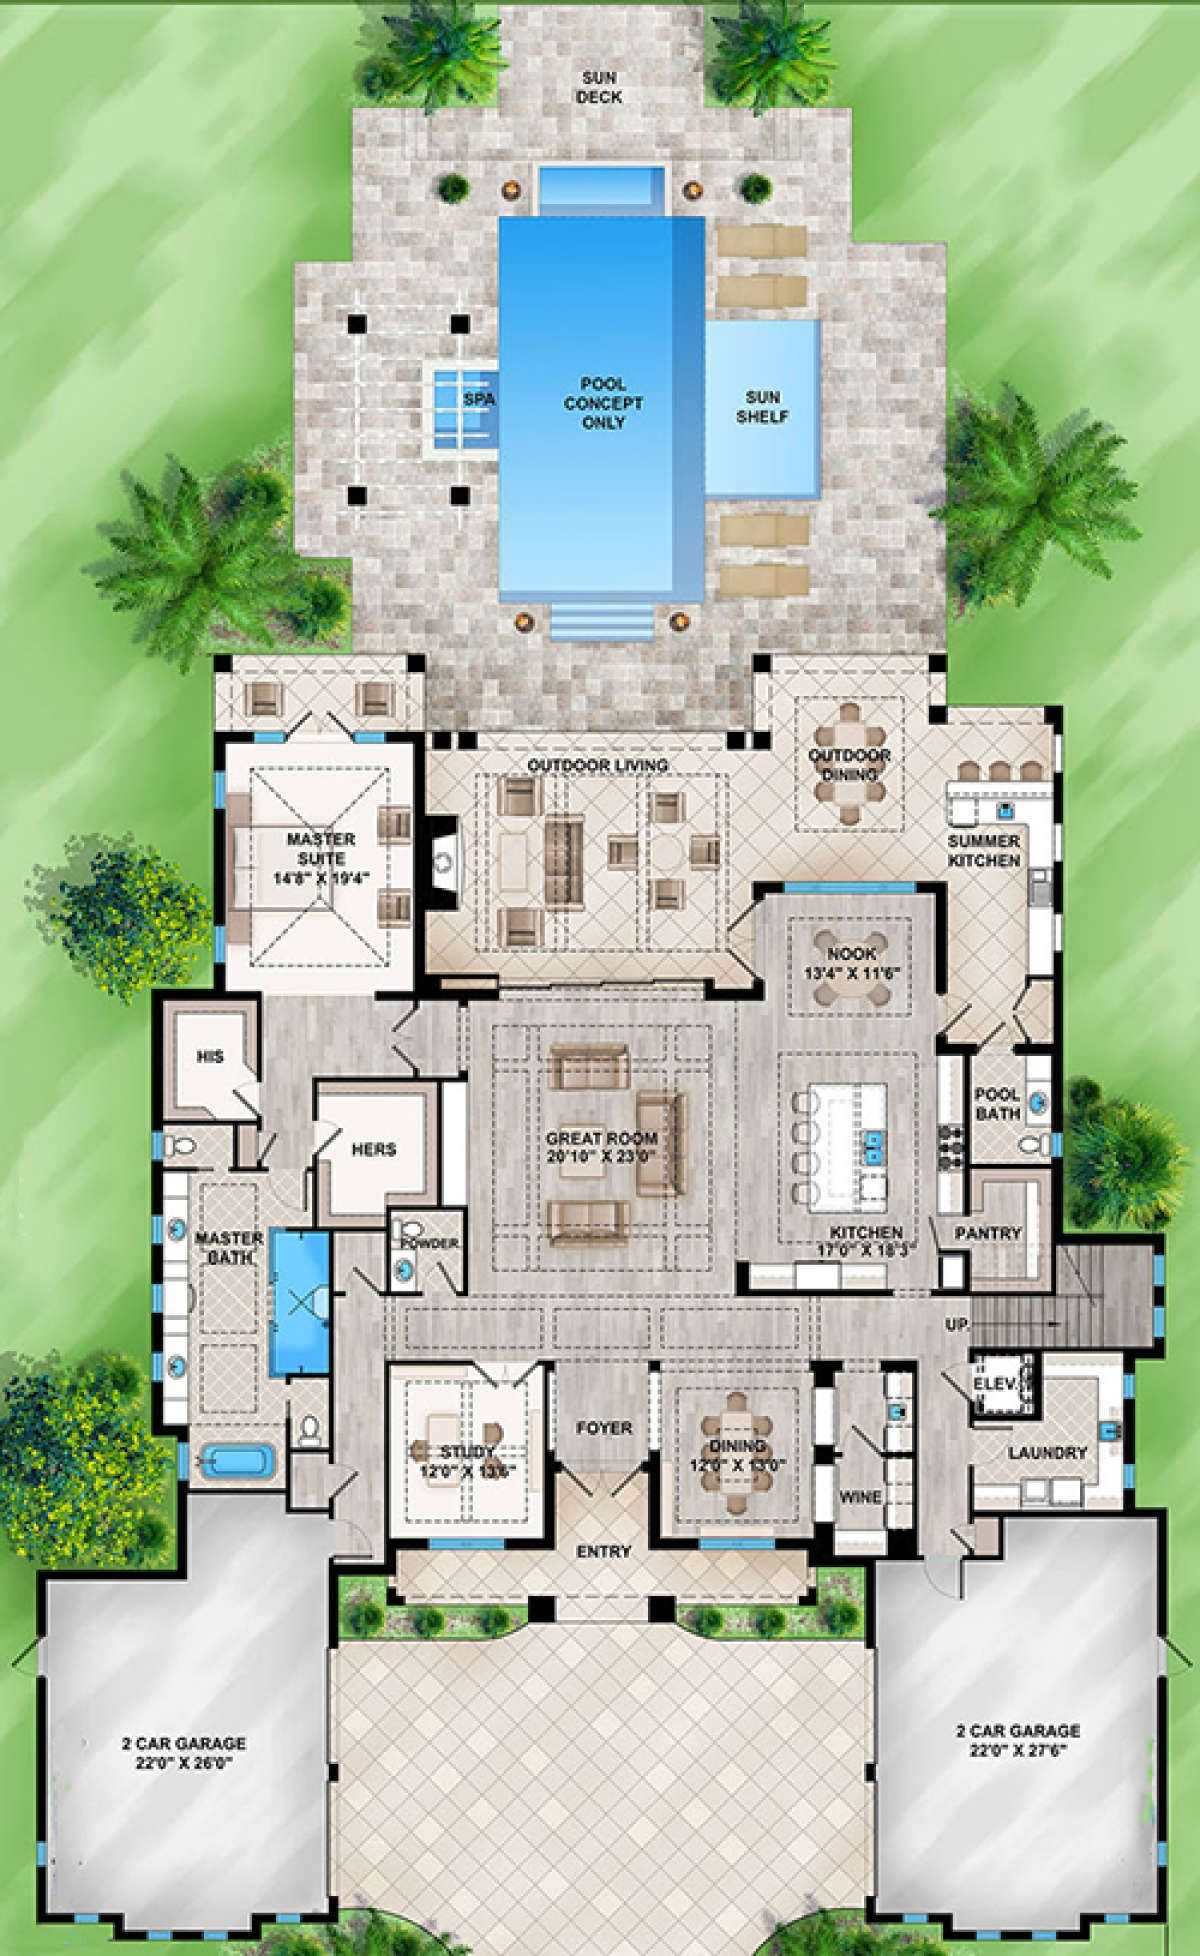 House Plan 207 00050 Florida Plan 5 464 Square Feet 4 Bedrooms 5 Bathrooms In 2021 Florida House Plans Dream House Plans Florida Home